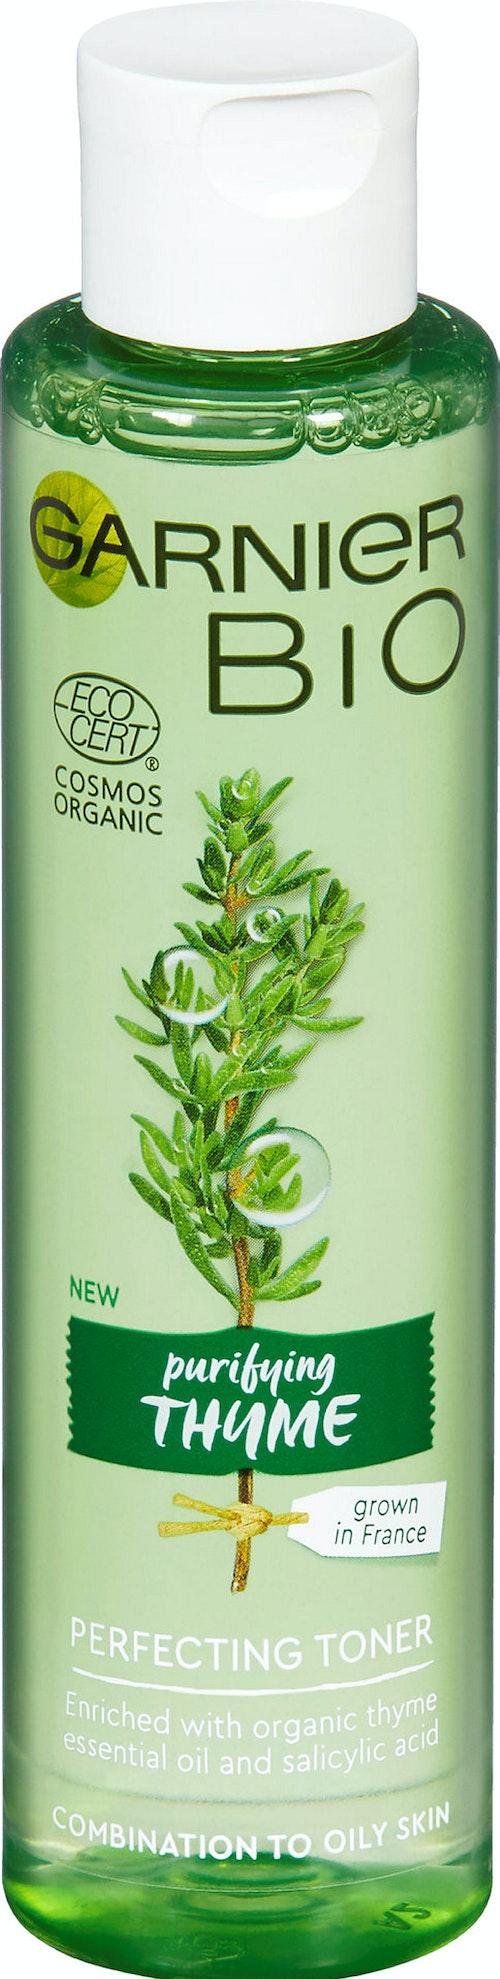 Garnier Purifying Thyme Perfecting Toner Garnier Bio 1 stk